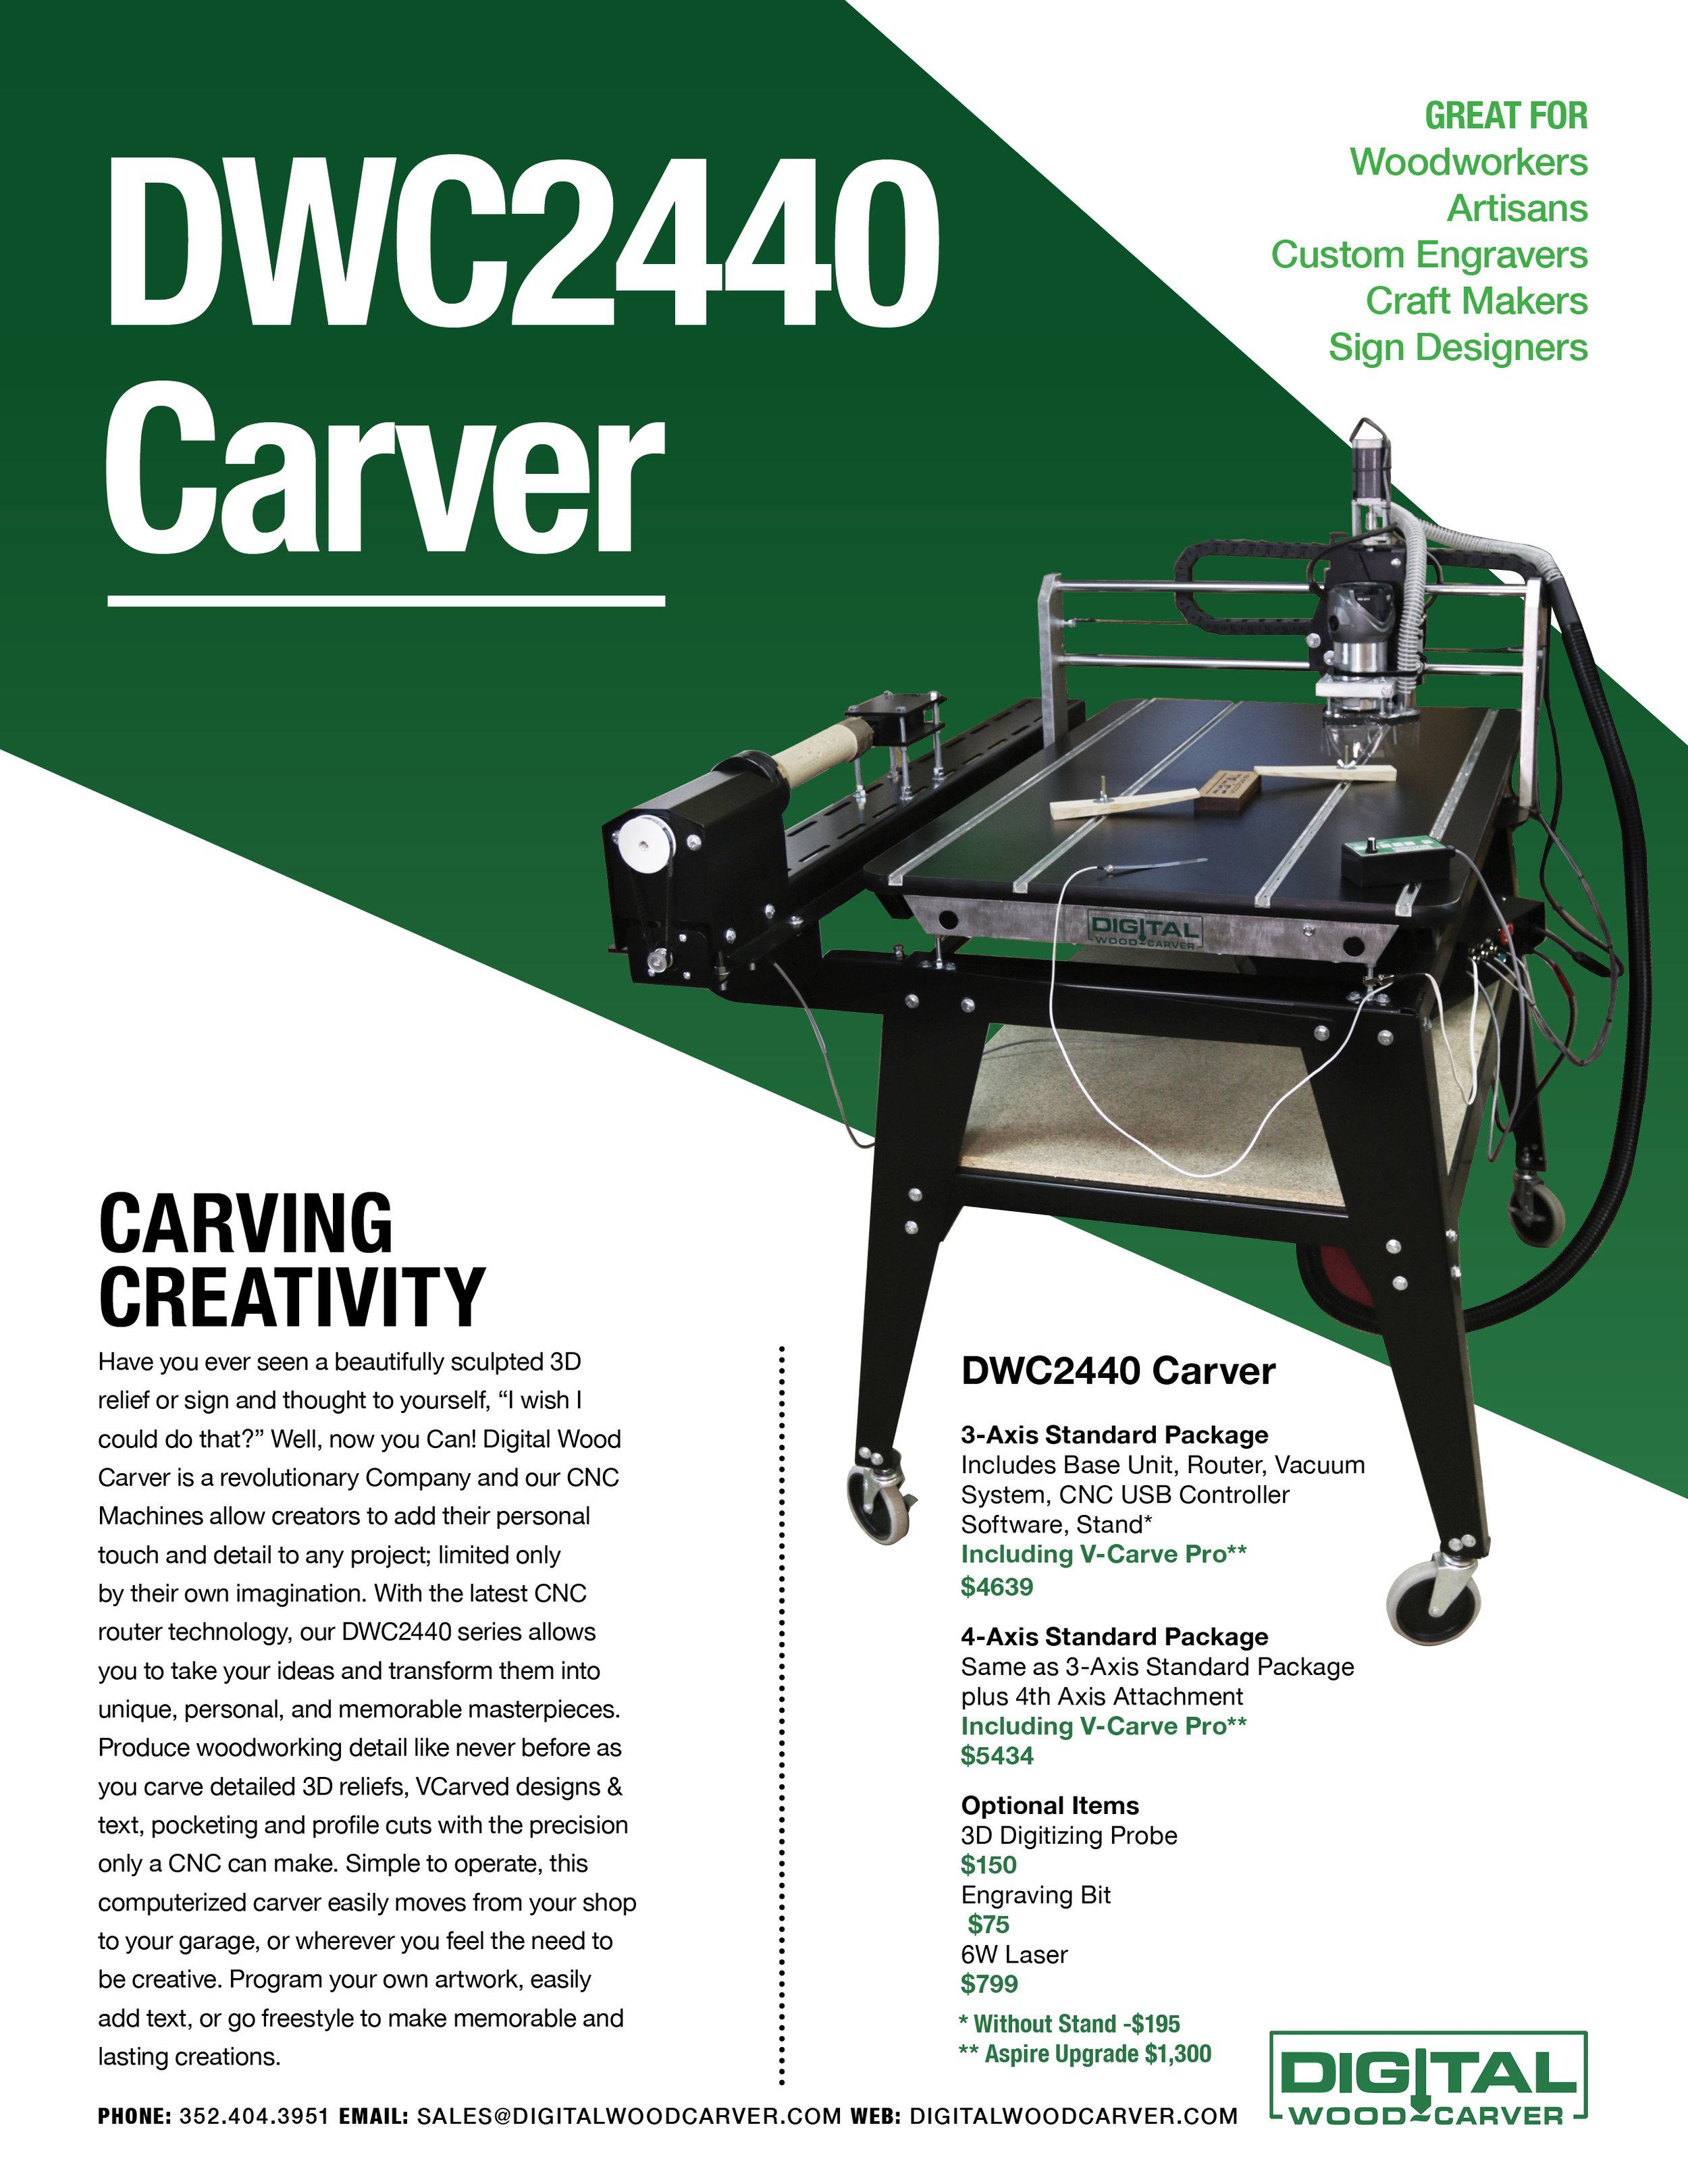 DWC2440 Carver.jpg